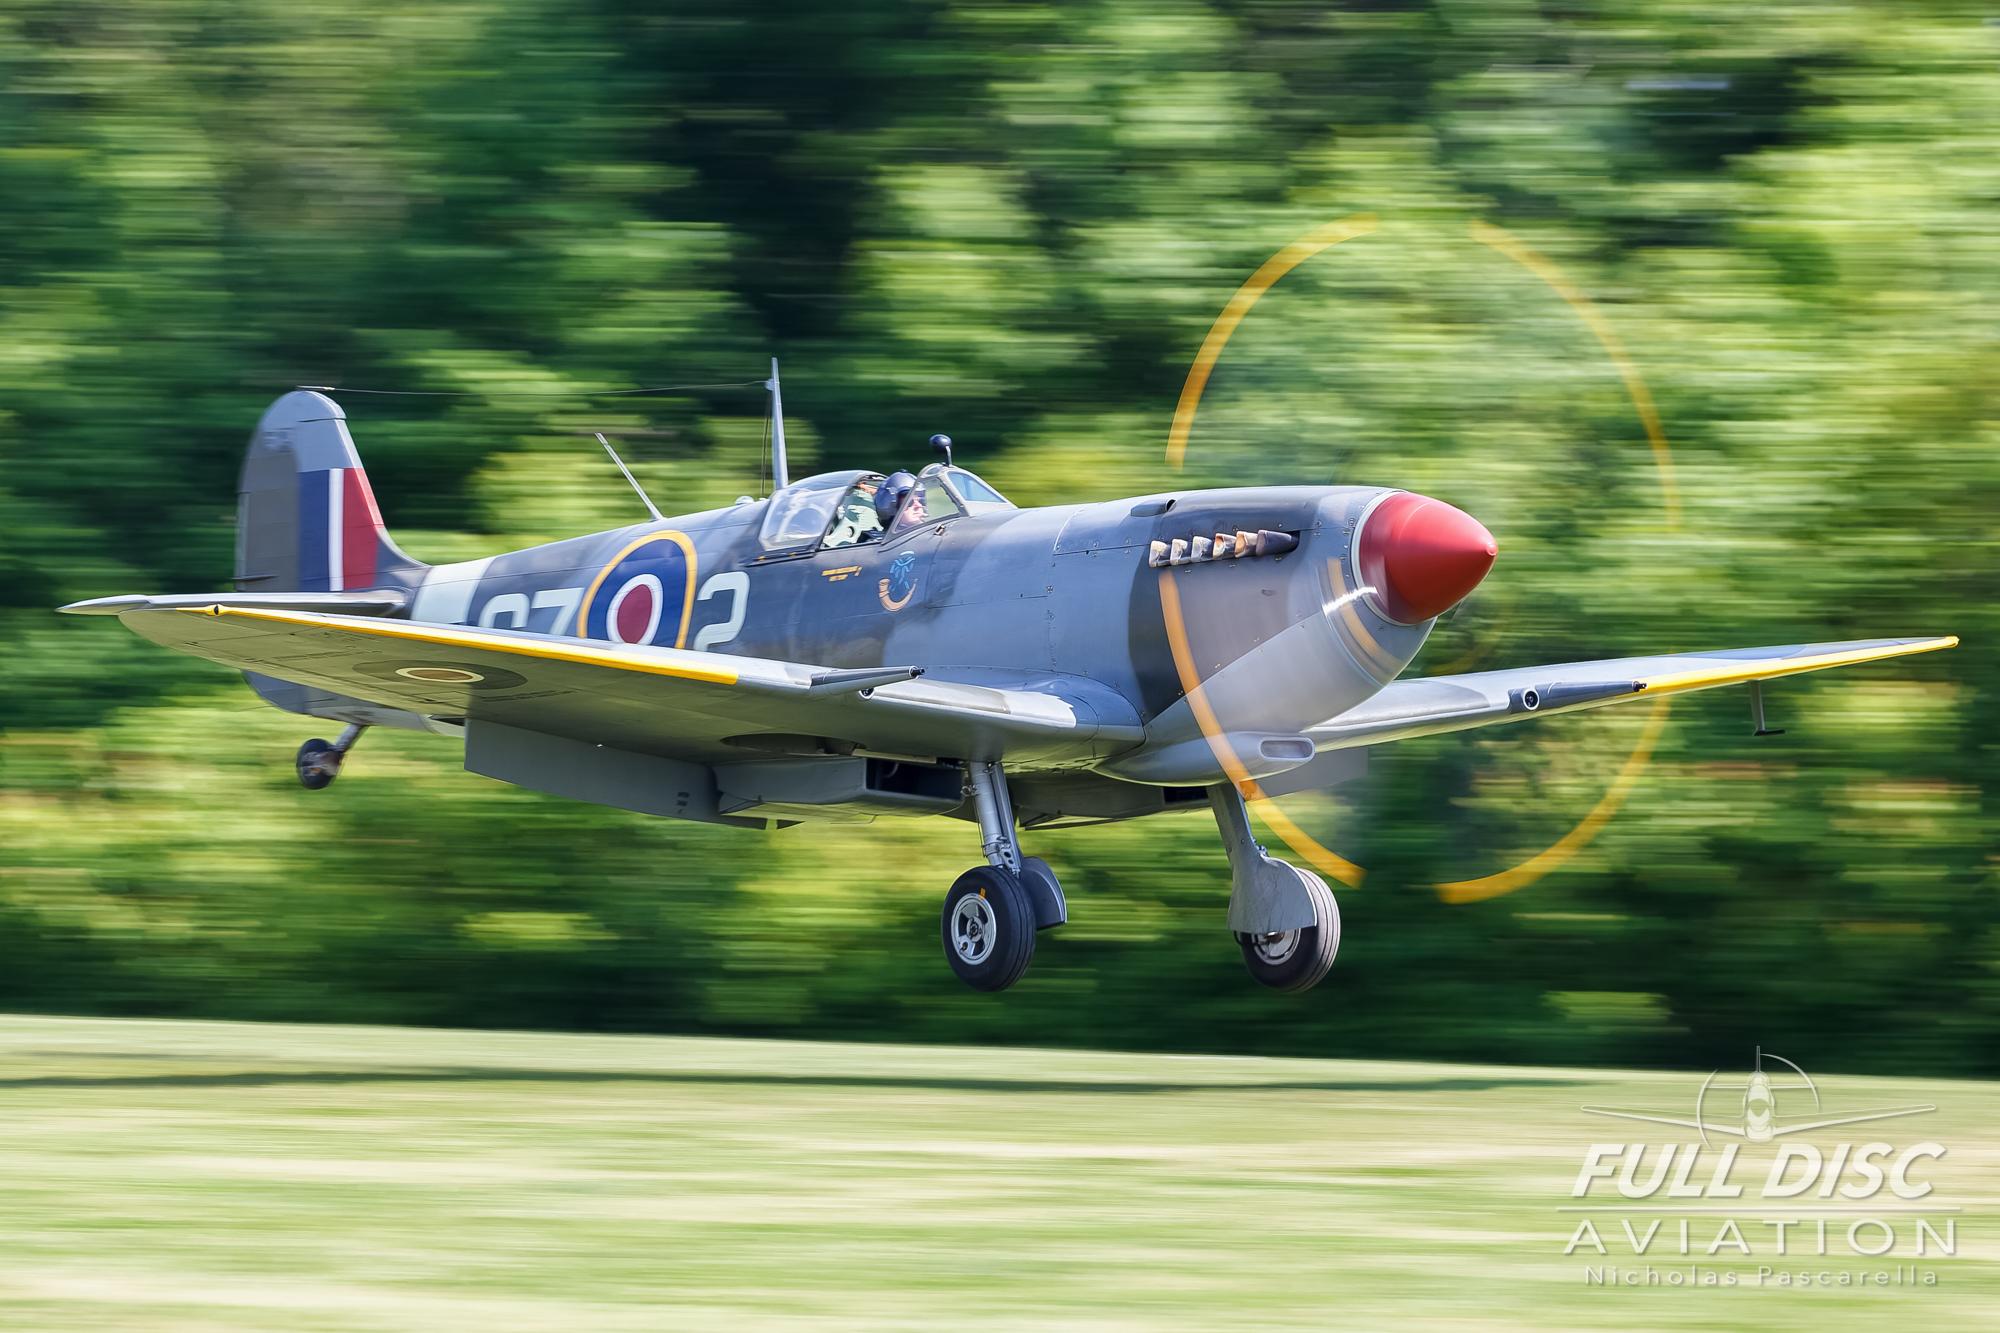 nickpascarella_nicholaspascarella_fulldiscaviation_aircraft_spitfire_landing.jpg